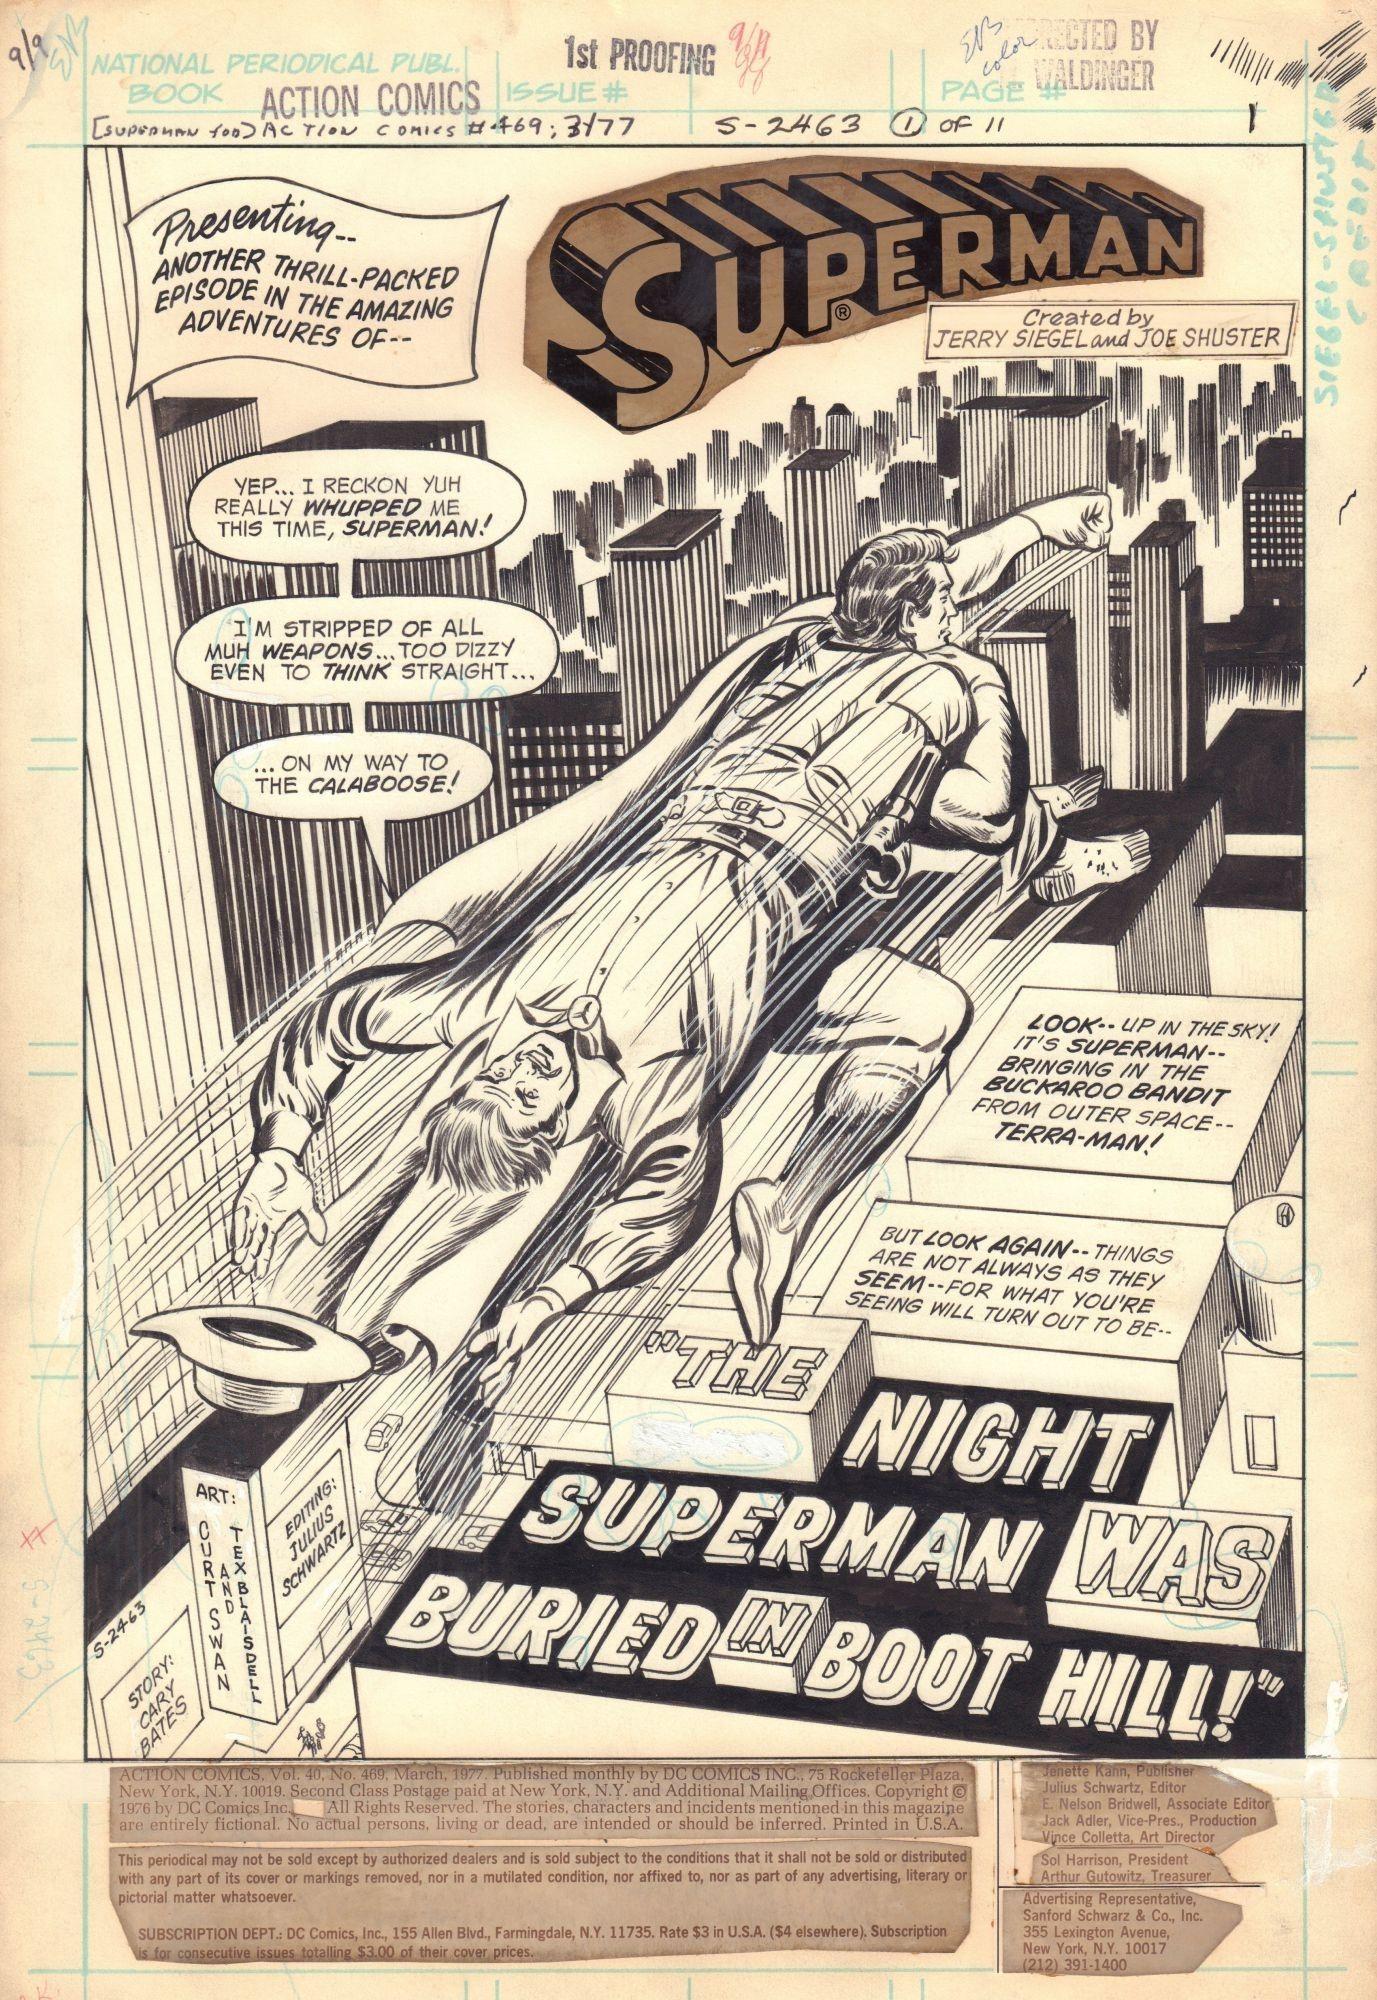 Action Comics #469 / 1